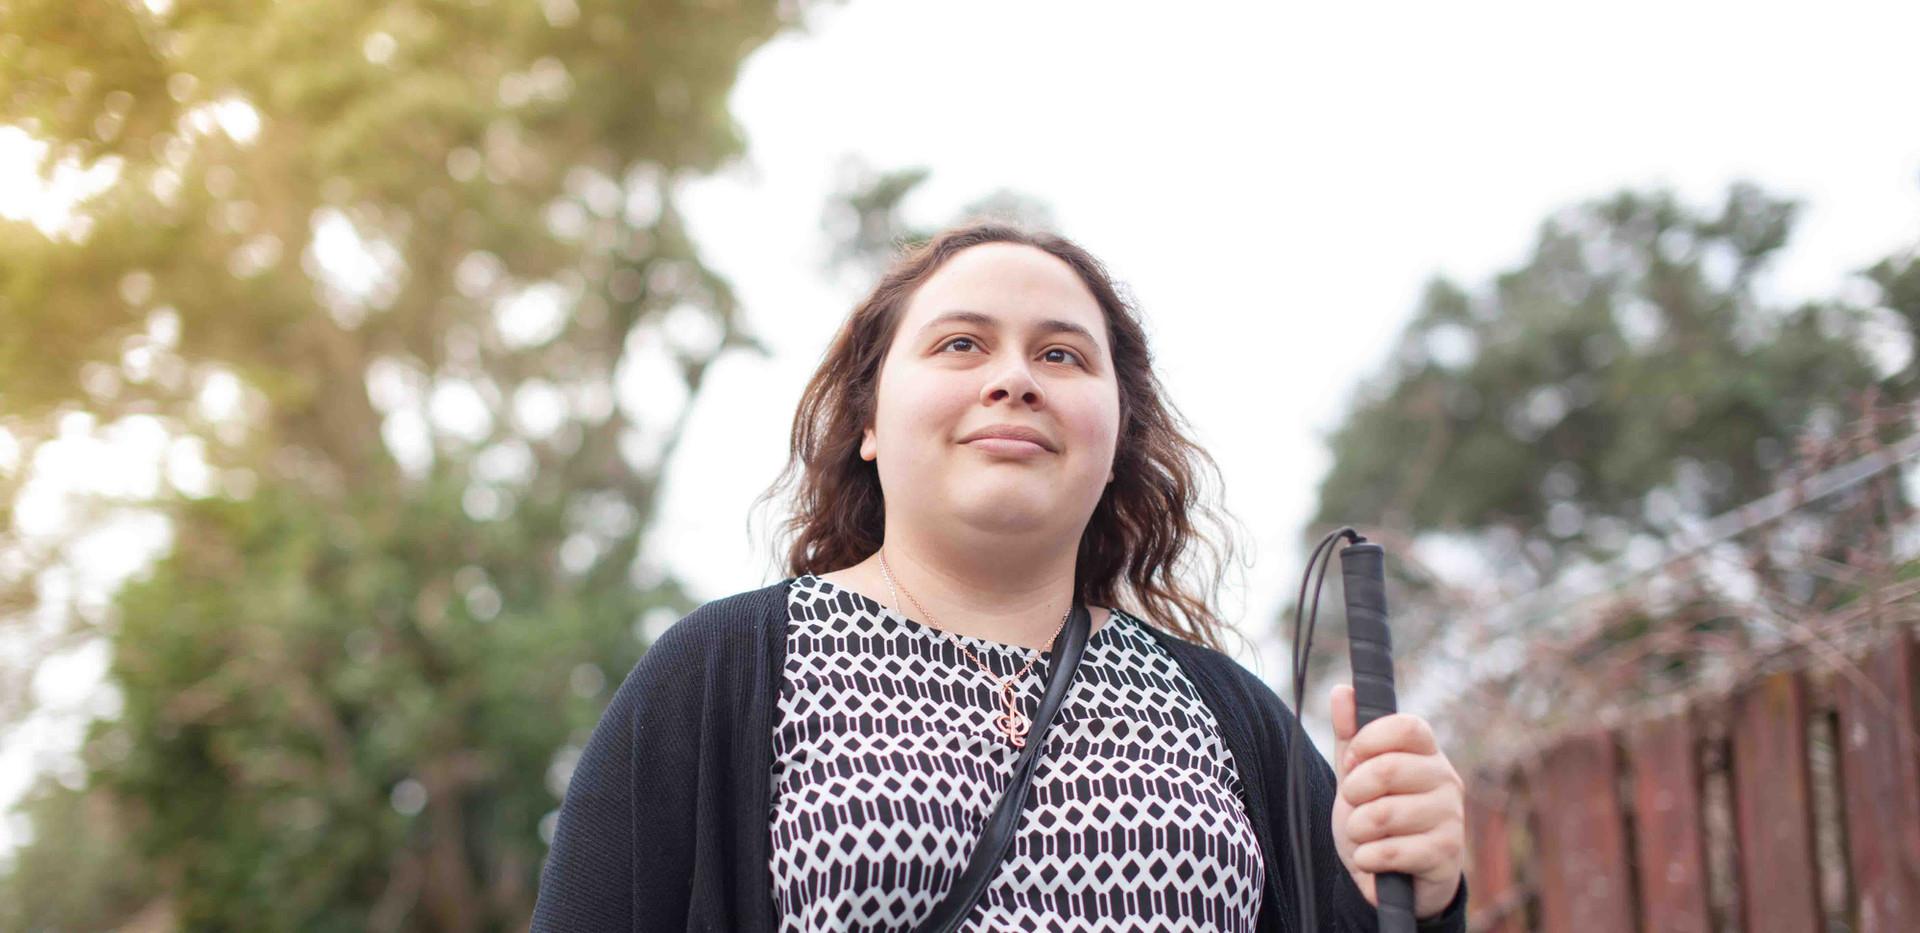 Natalie Te Paa_NZ_2016_Herstory_SaraOrm